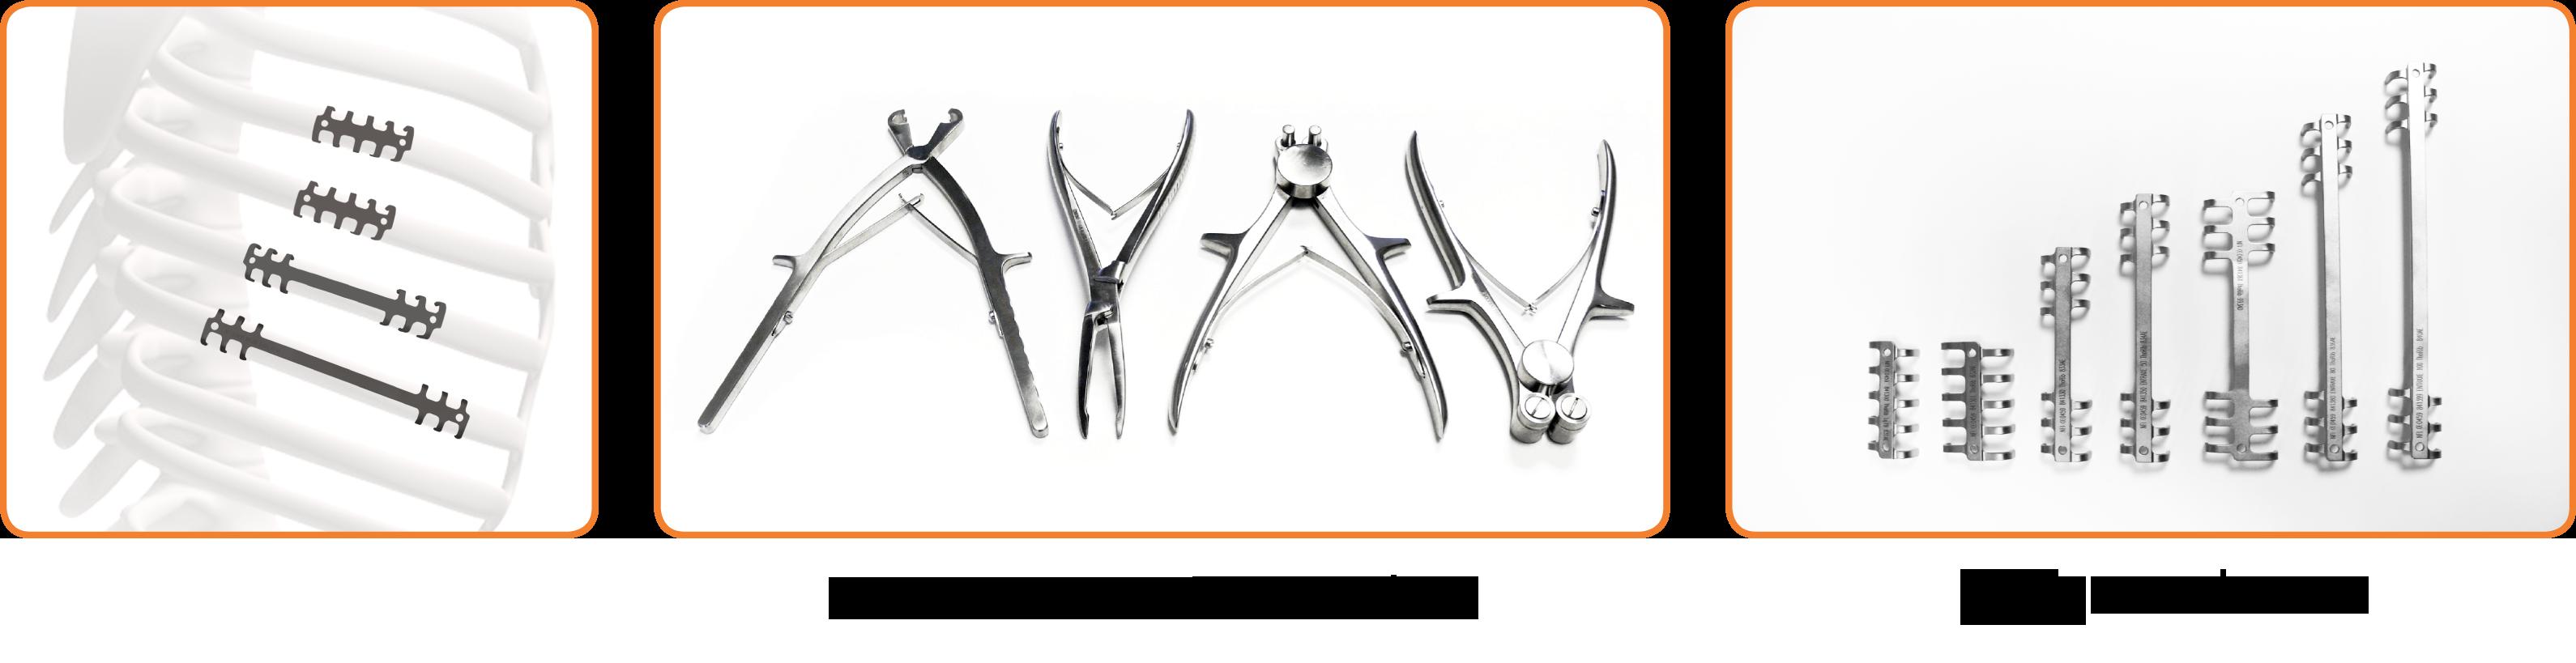 ThoRib® ostéosynthèse thoracique instruments et implants